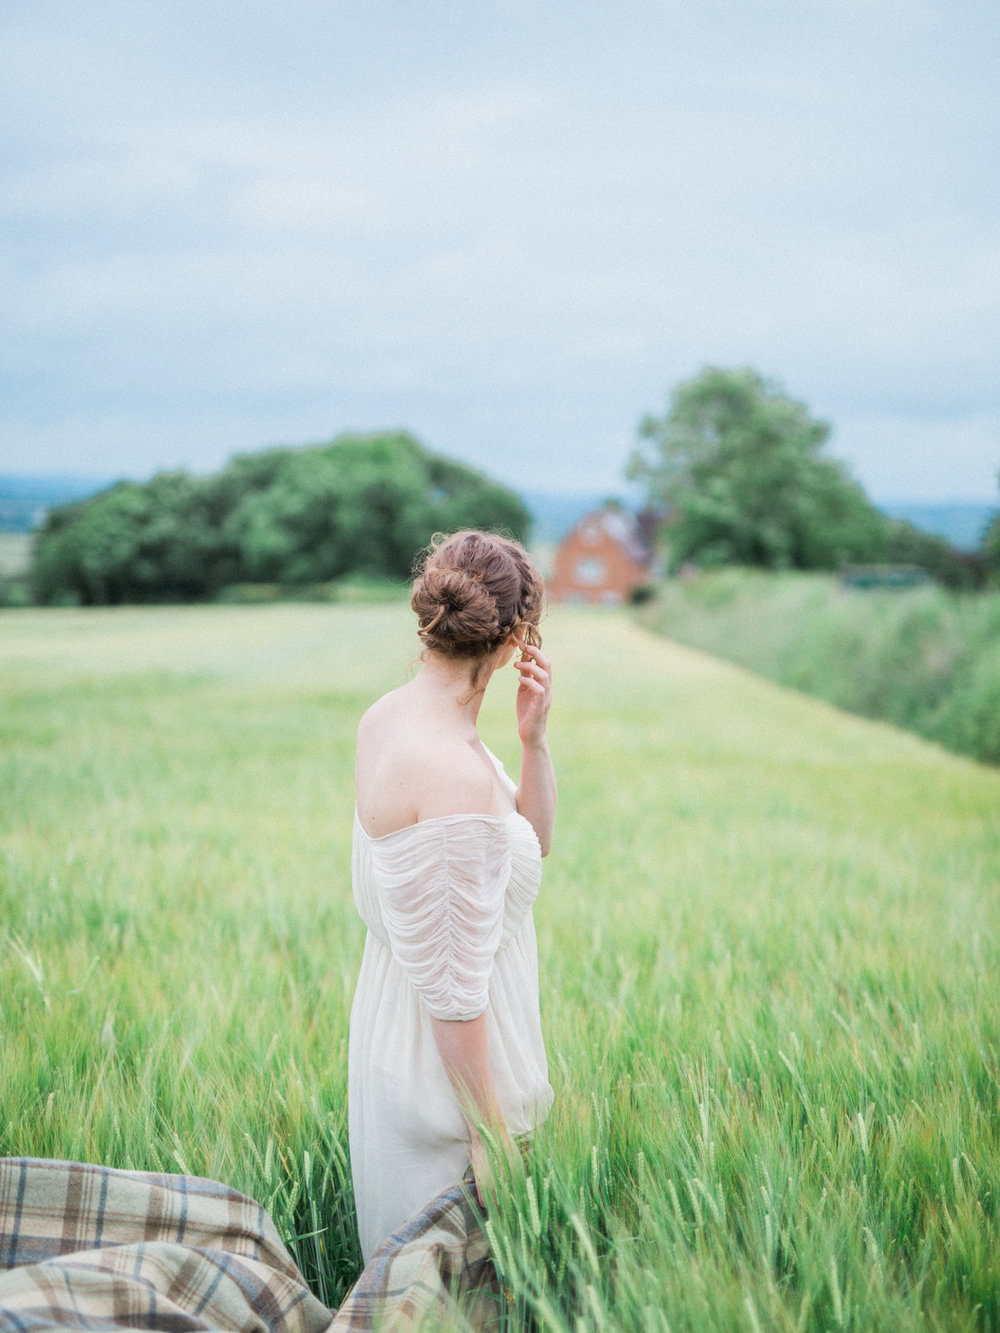 DanielleGirouxPhotography_EuropeTrip0C6A8964.jpg